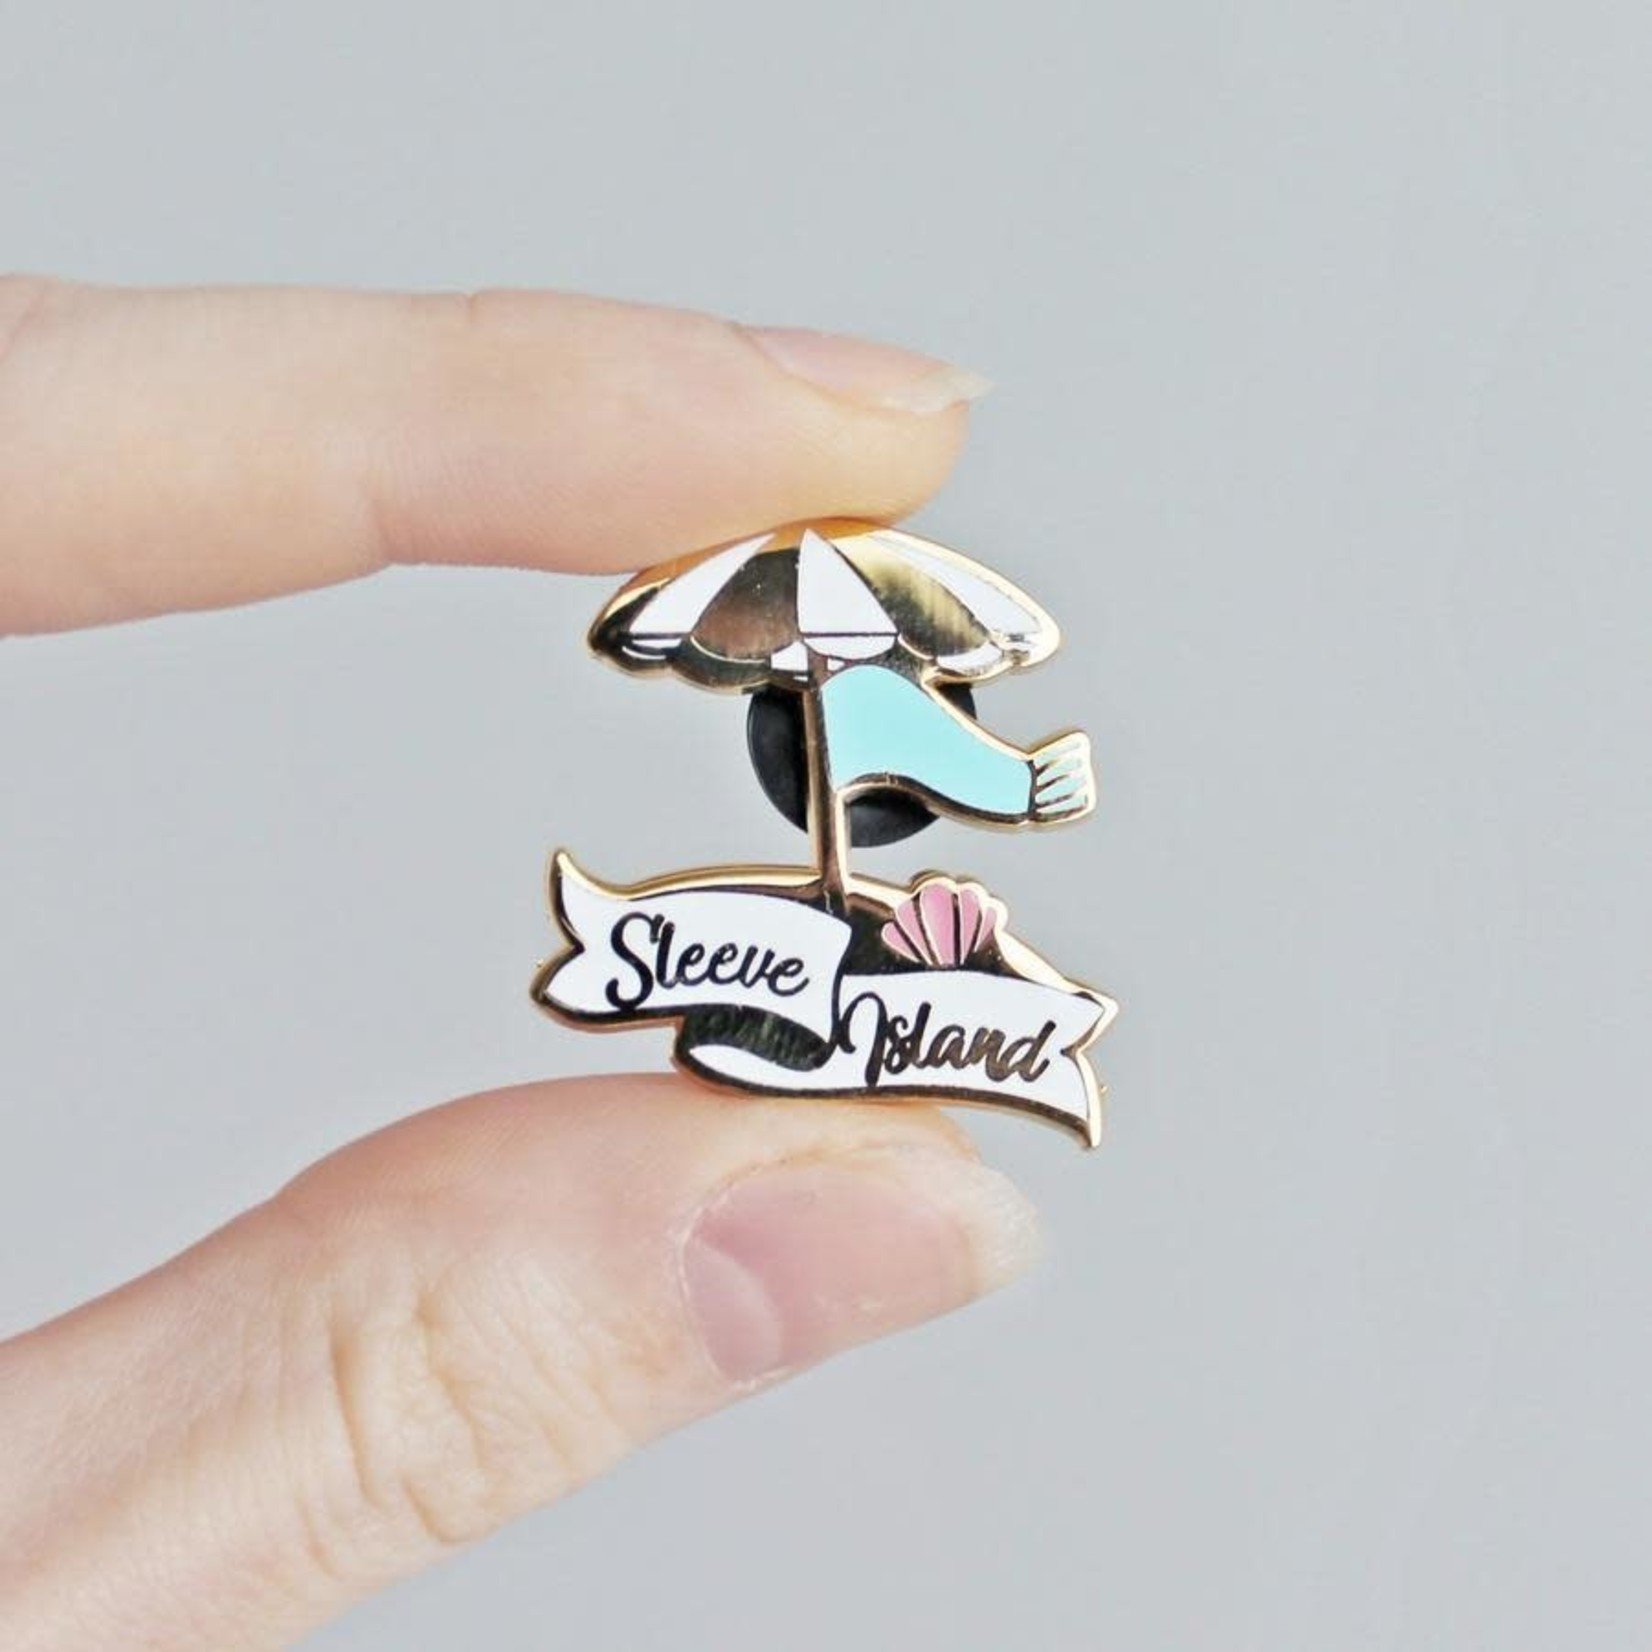 Twill & Print Sleeve Island Enamel Pin